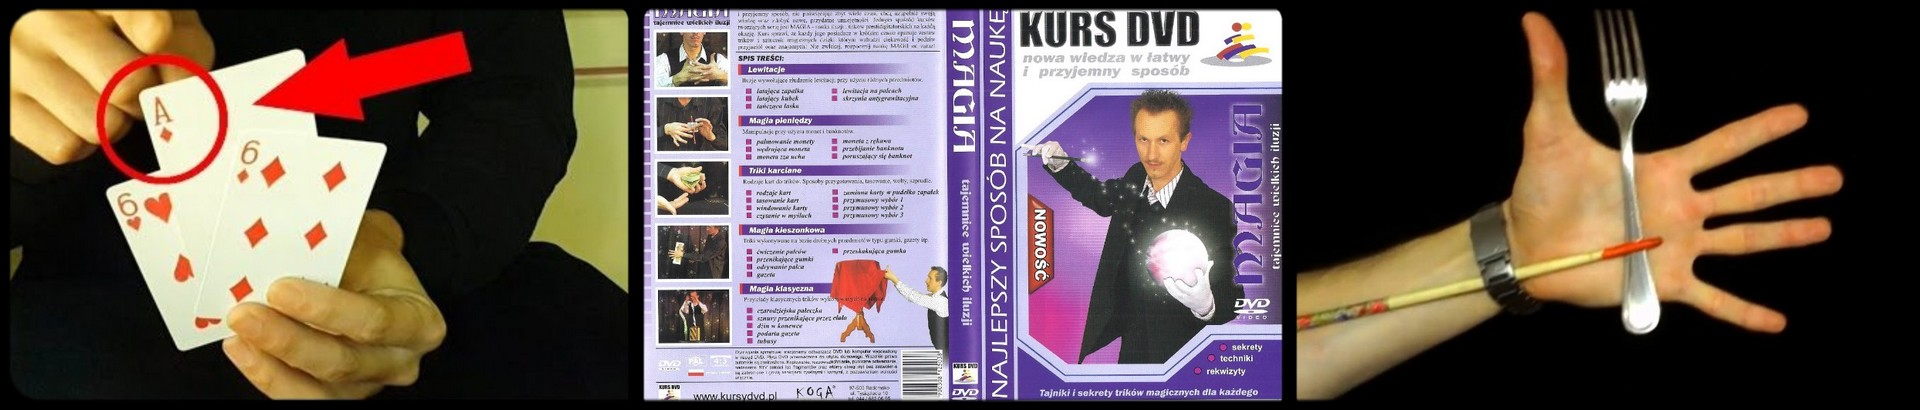 kurs magii iluzjonista dvd